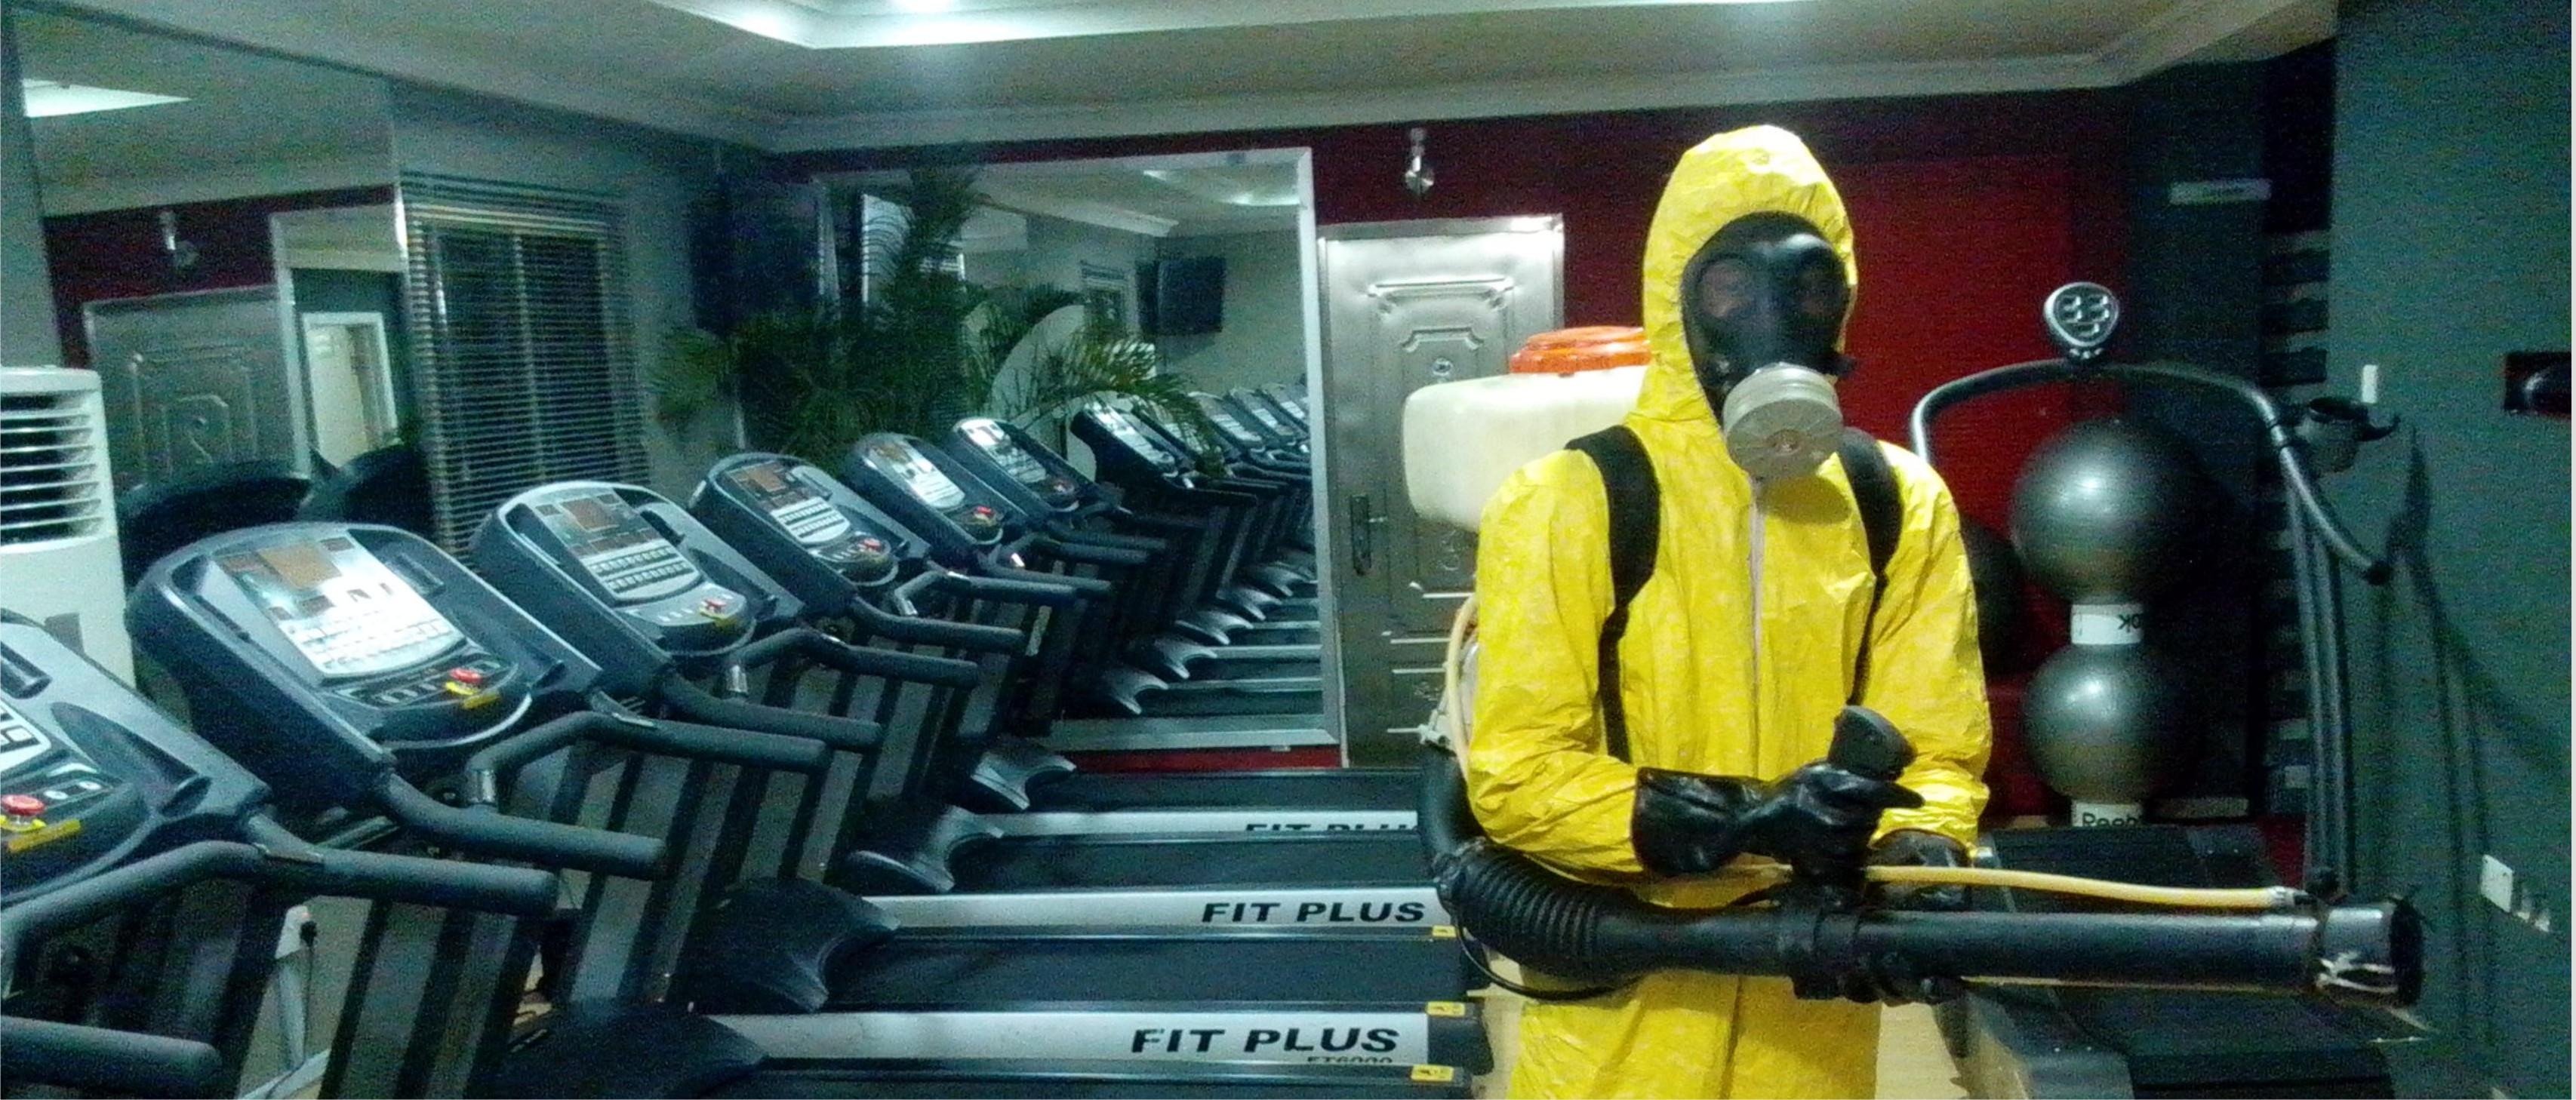 pest-control-company4